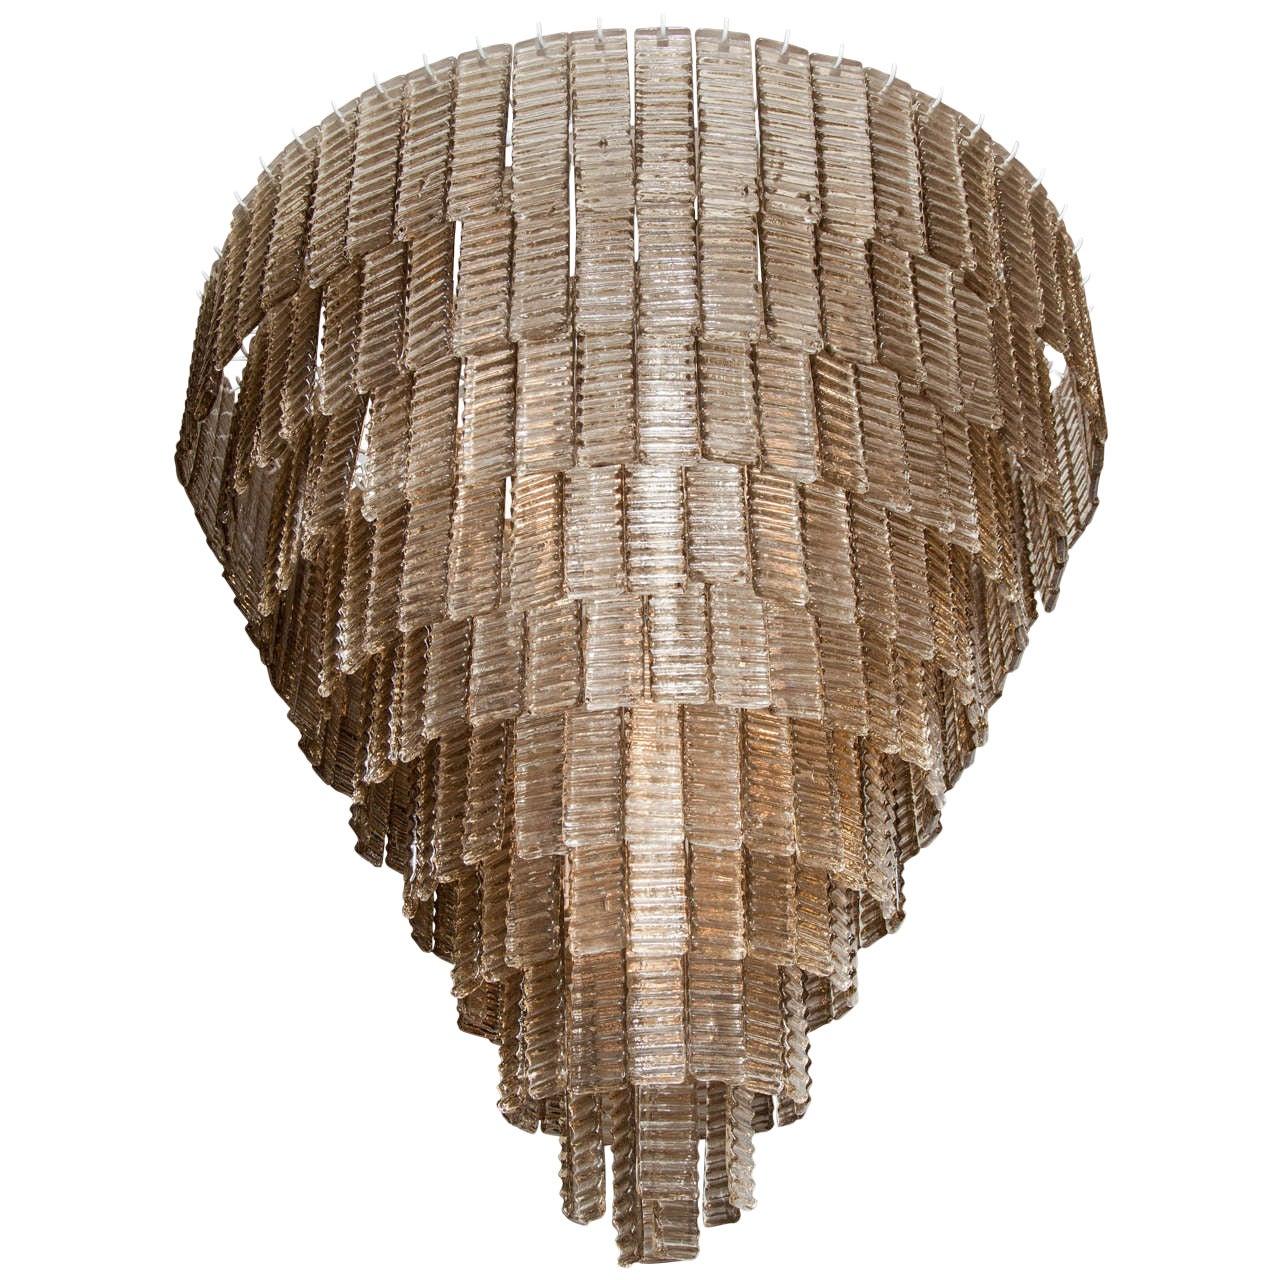 Large Venini Style Taupe Smoke Murano Glass Round Chandelier, Italy, 2020